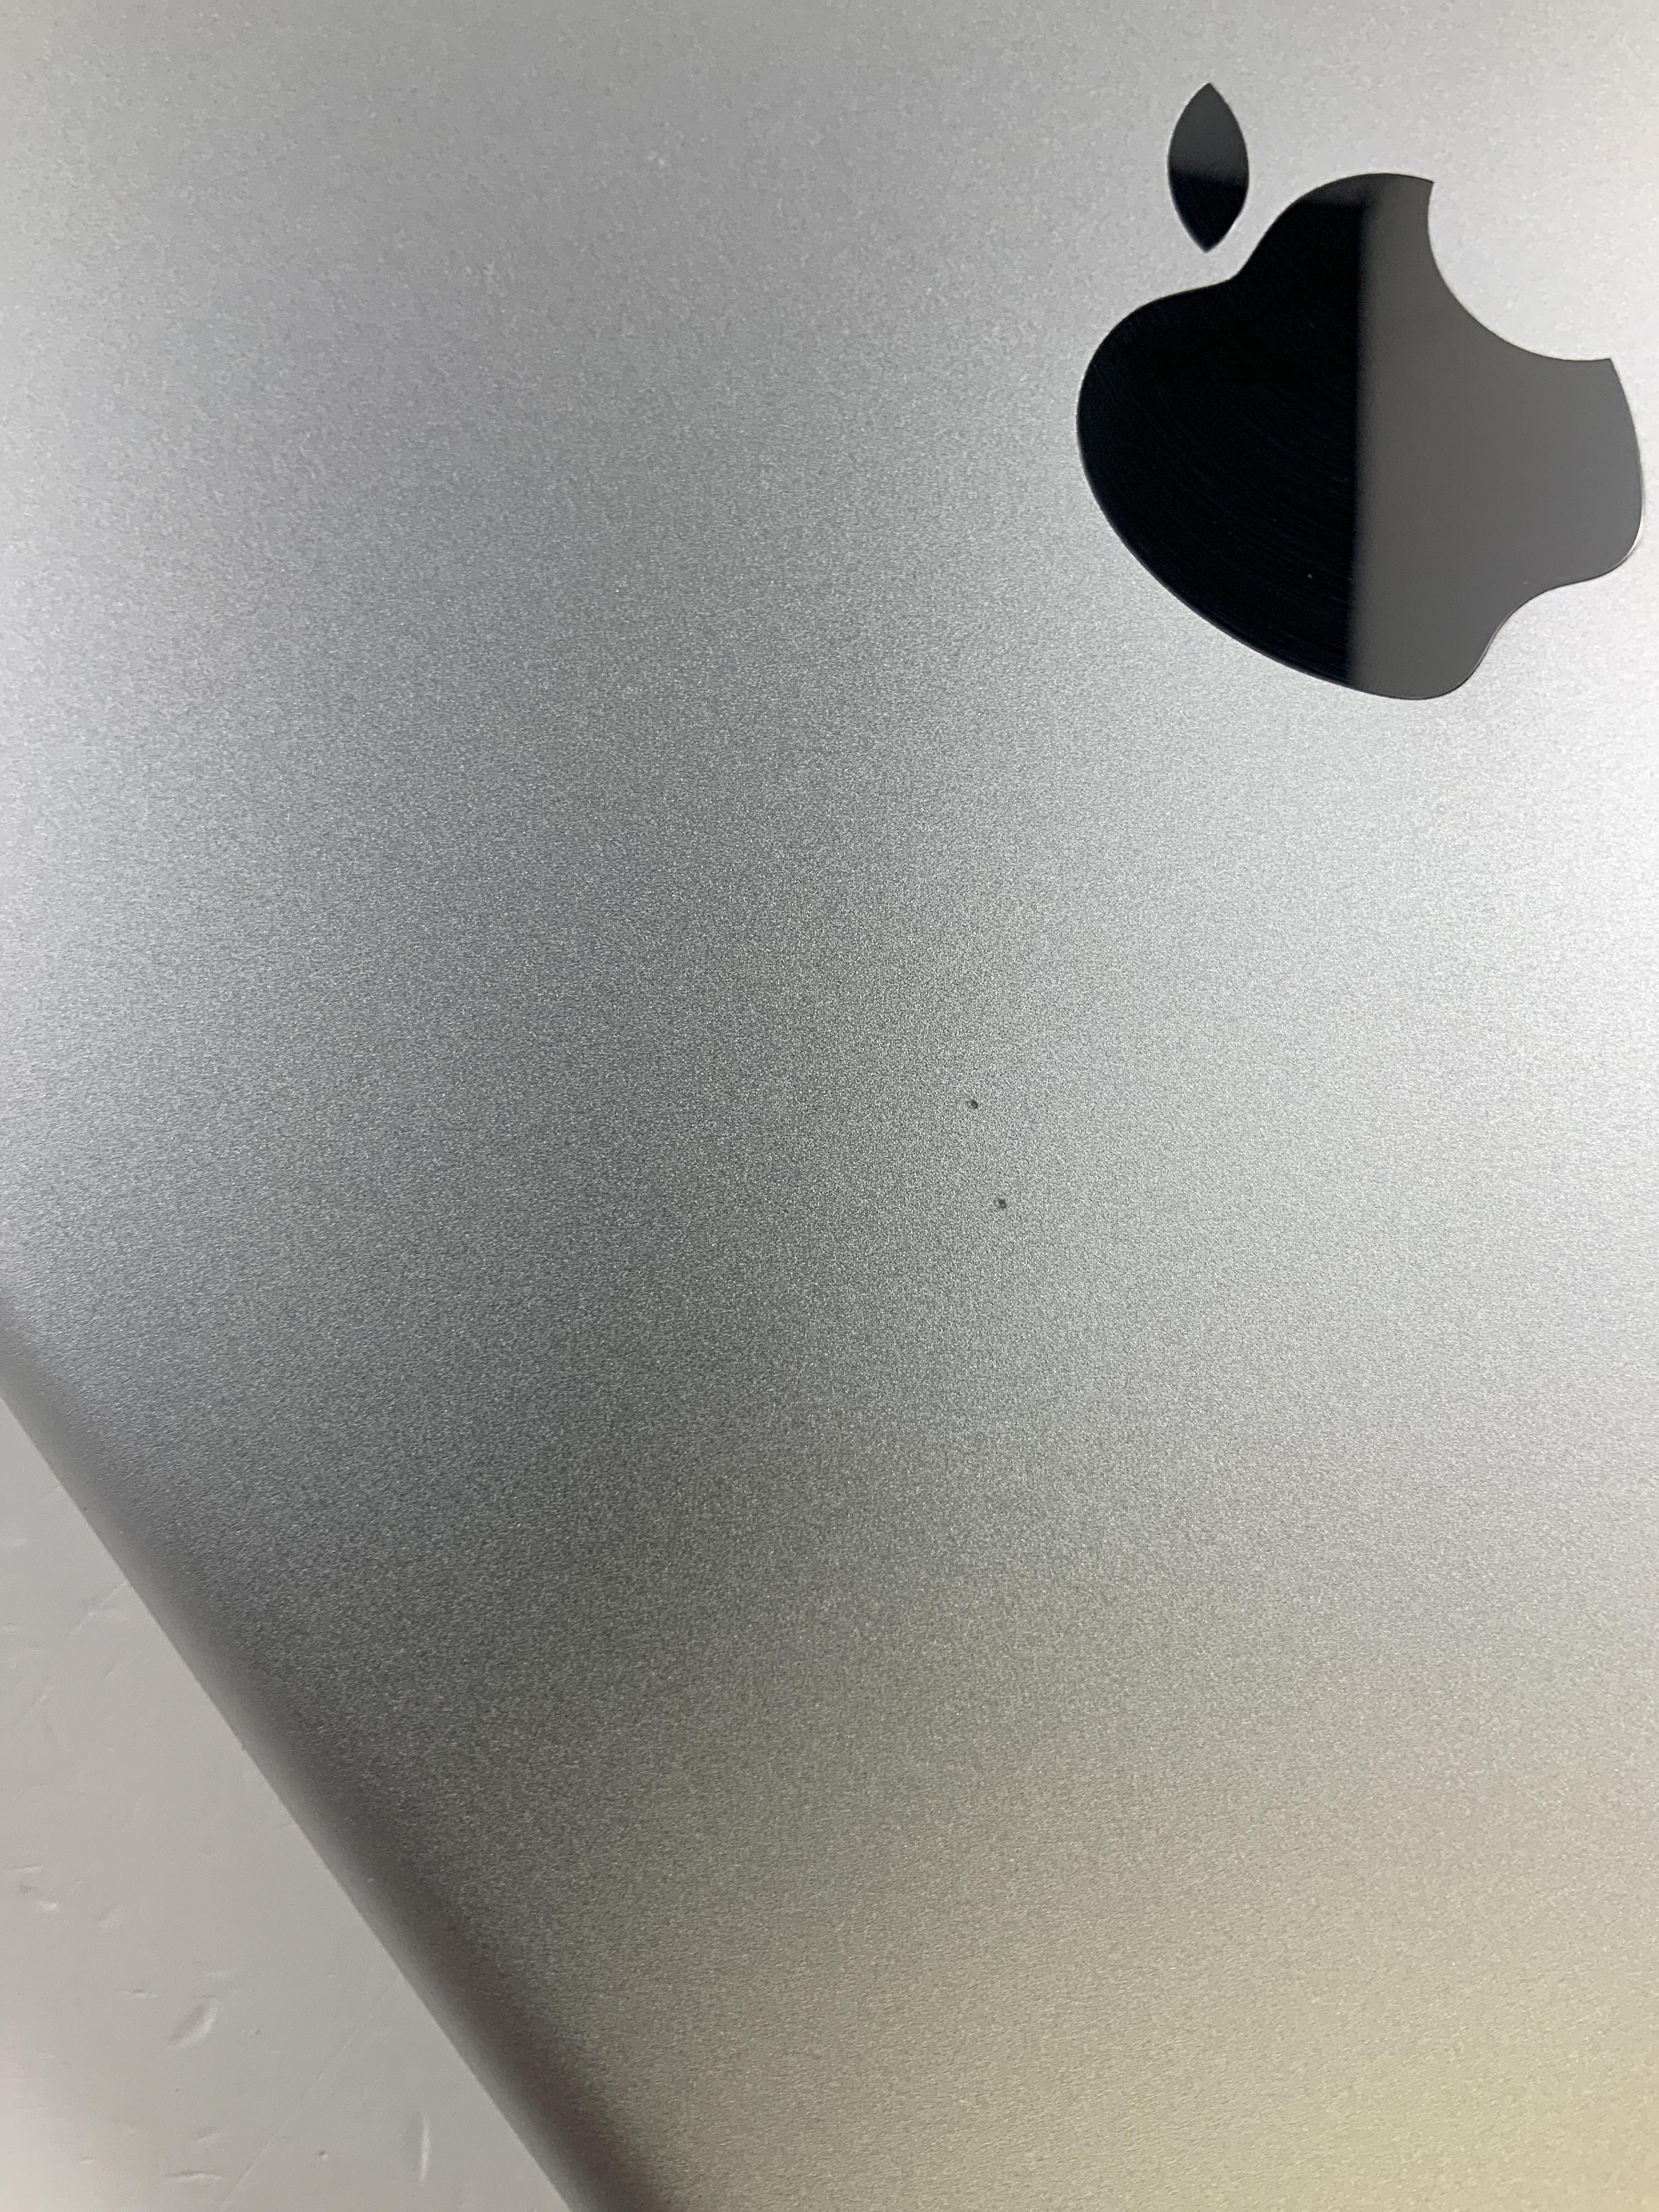 iPad 6 Wi-Fi + Cellular 128GB, 128GB, Silver, bild 3